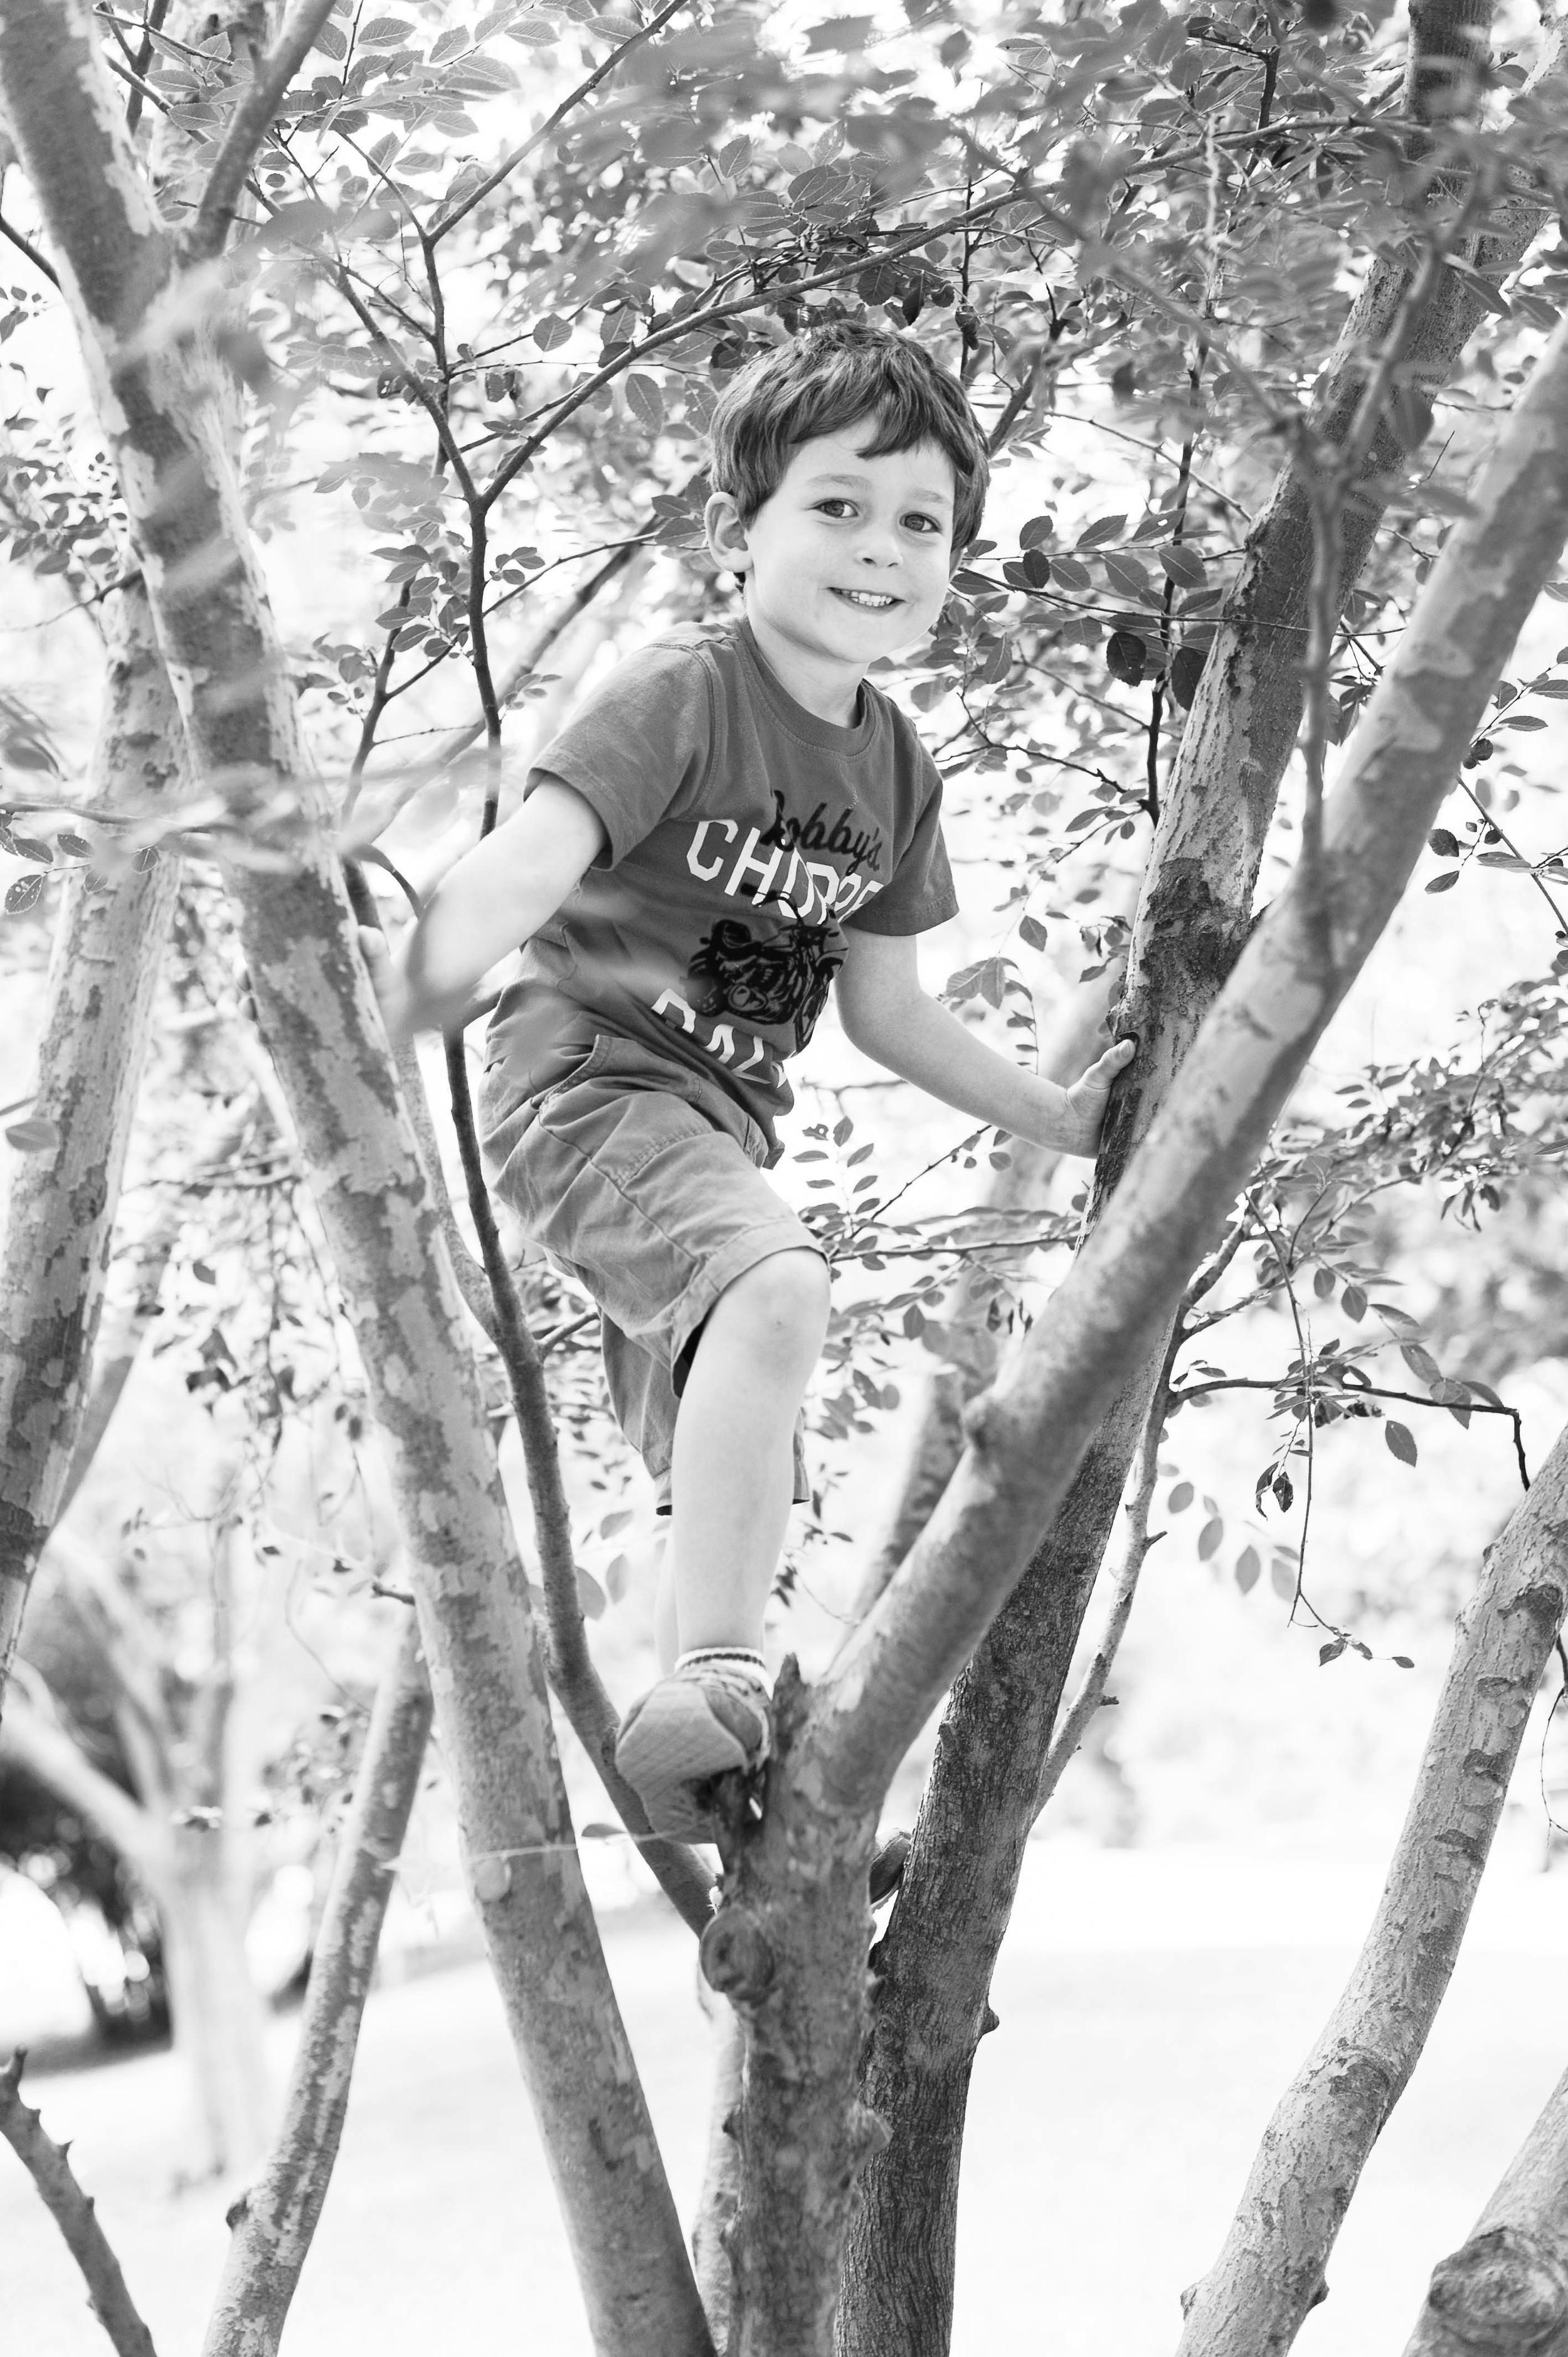 So happy in his old climbin' tree.